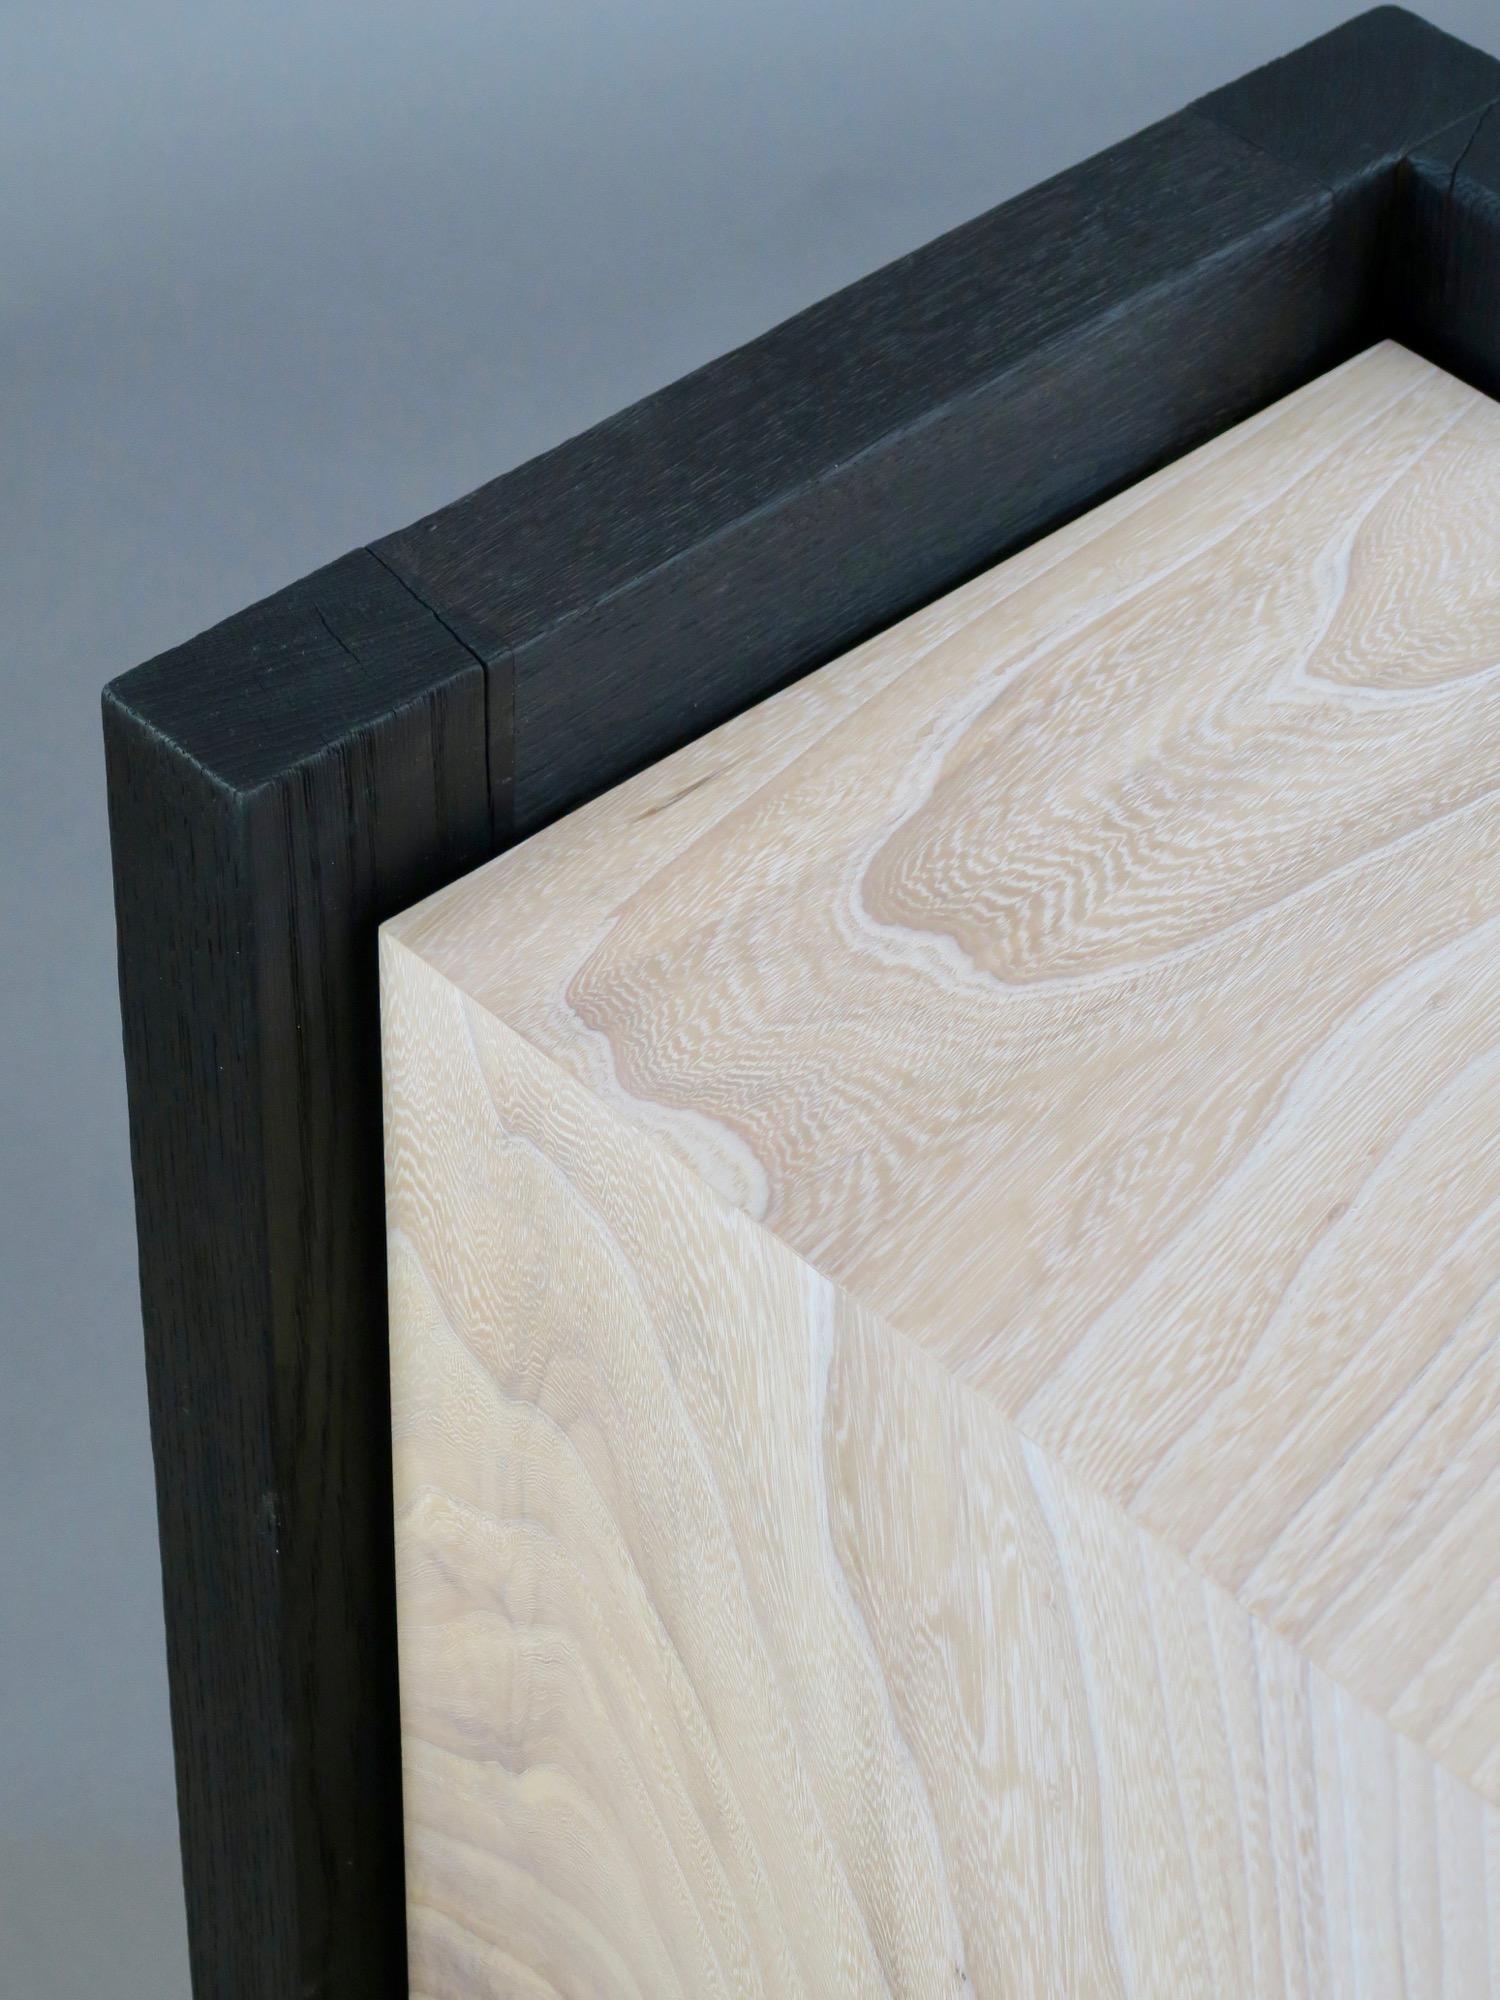 Havana side table 2 - cerused elm, scorched oak - top detail